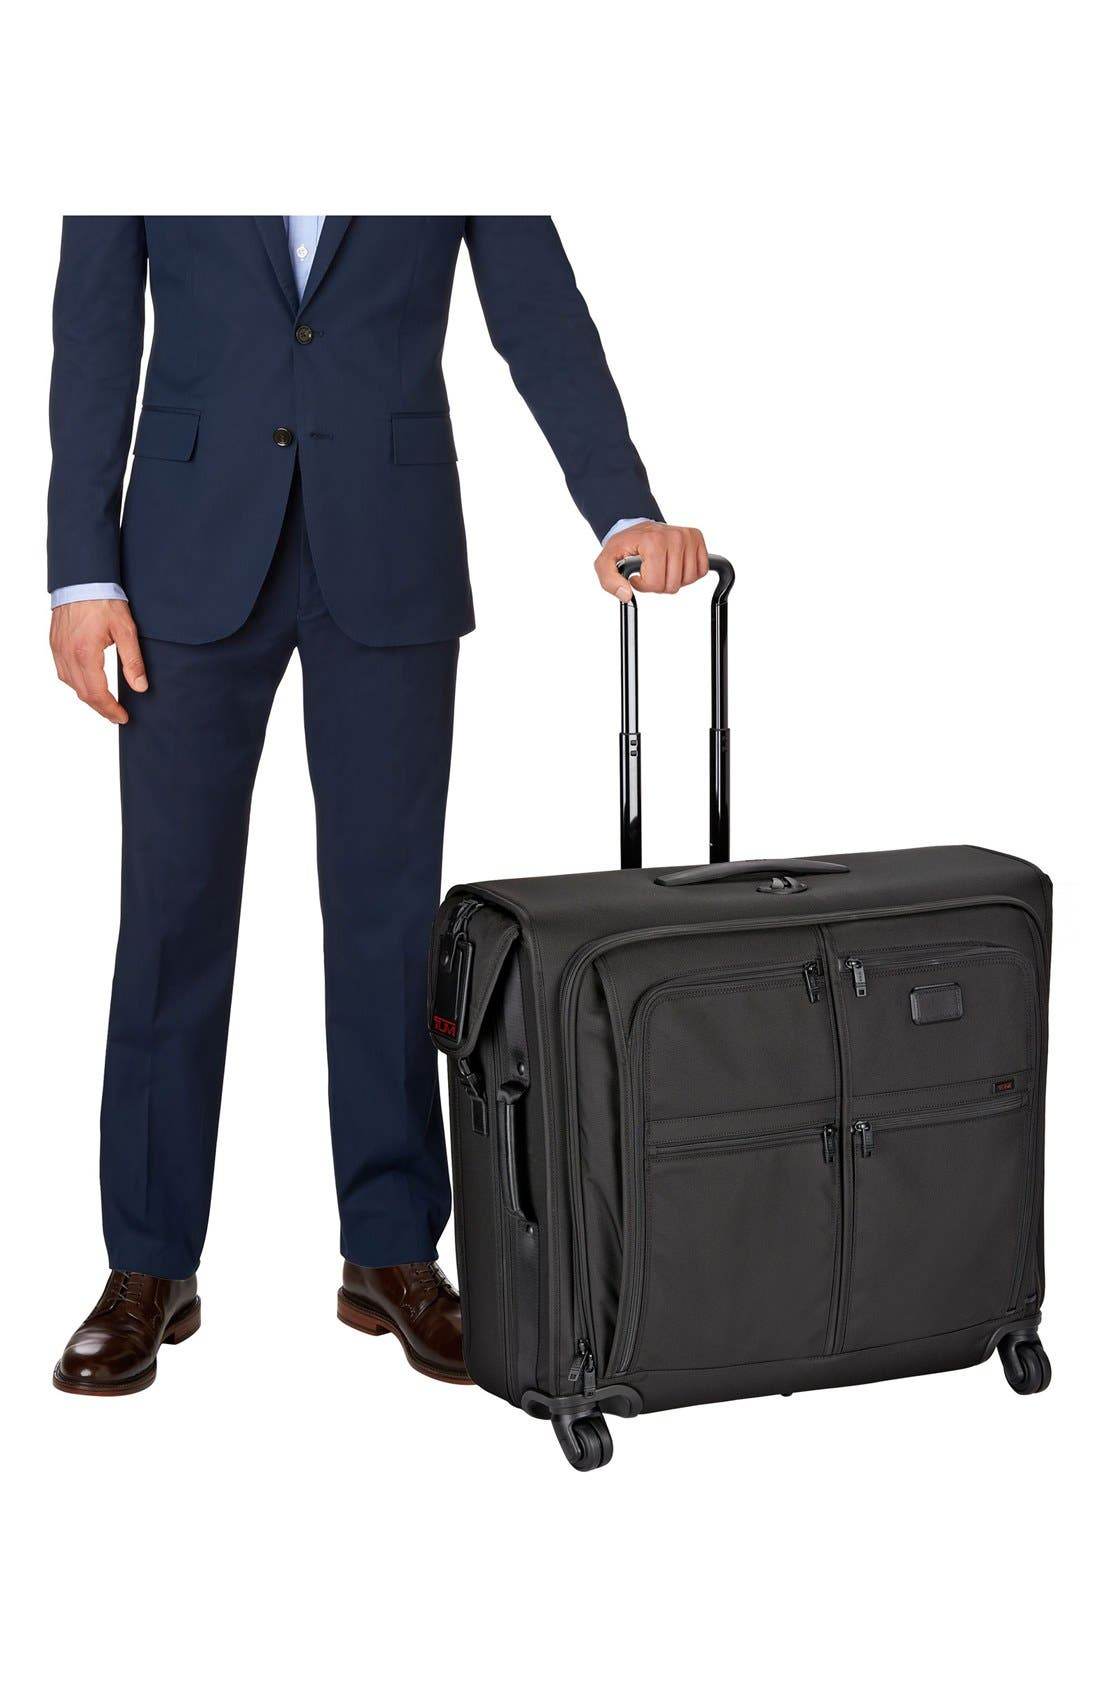 Alpha 2 Extended Trip Wheeled Garment Bag,                             Alternate thumbnail 6, color,